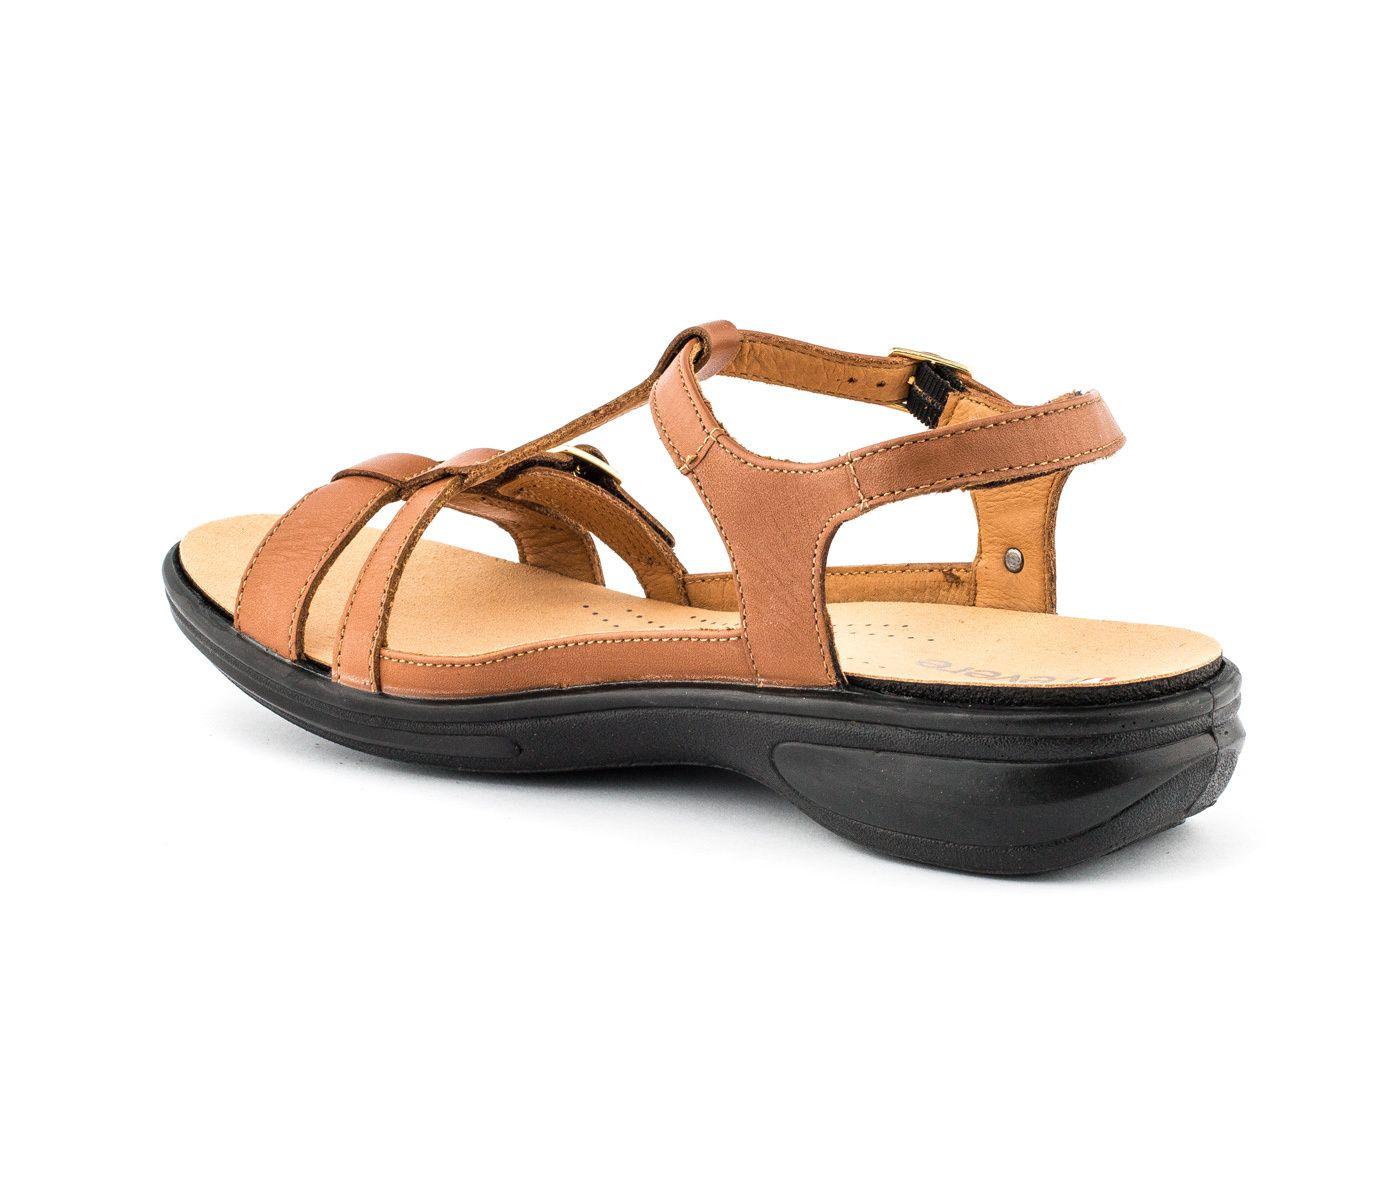 4b9eb6e3e Revere Comfort Option Milan - Buy Women Shoes Online